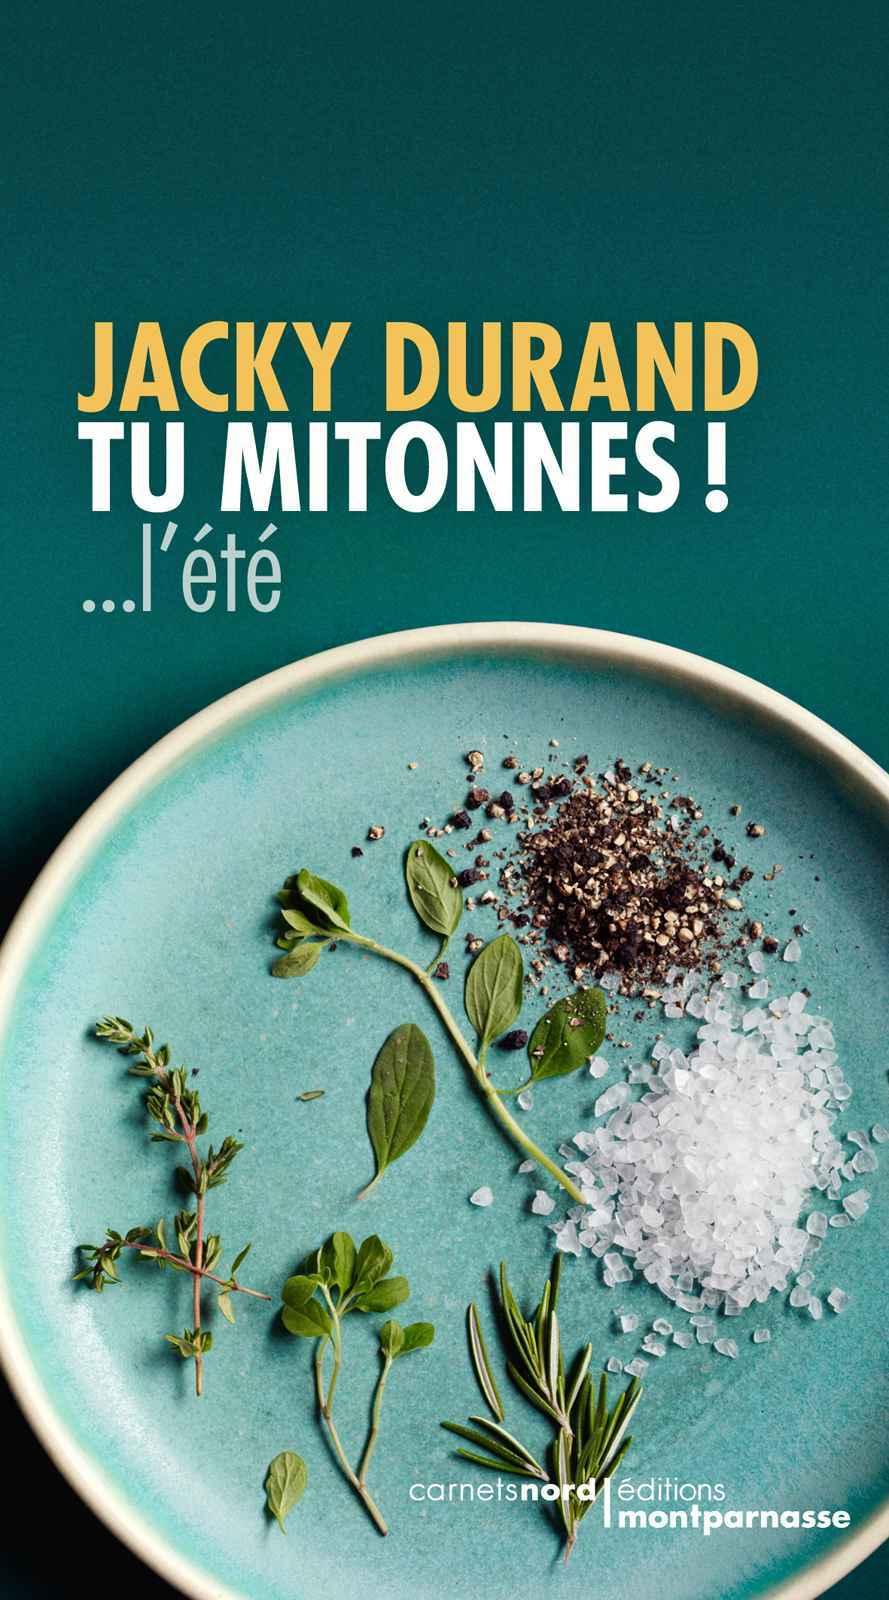 Tu mitonnes !... lété  by  Jacky DURAND